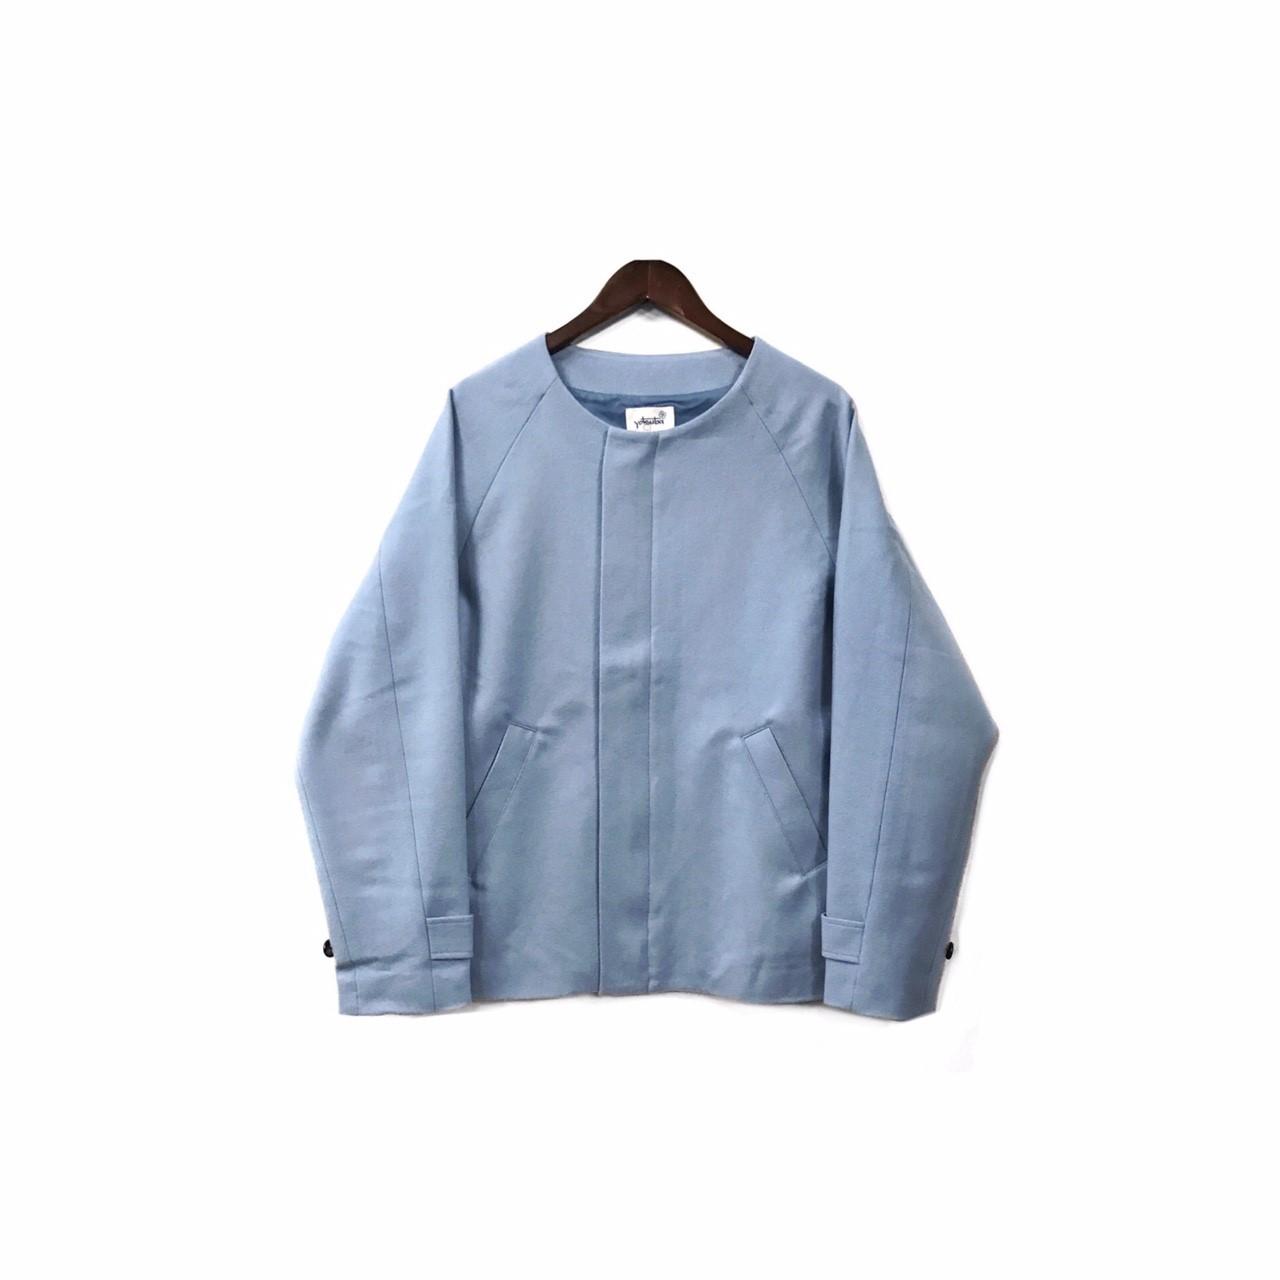 yotsuba - Nocollar Jacket / Light Blue ¥35000+tax